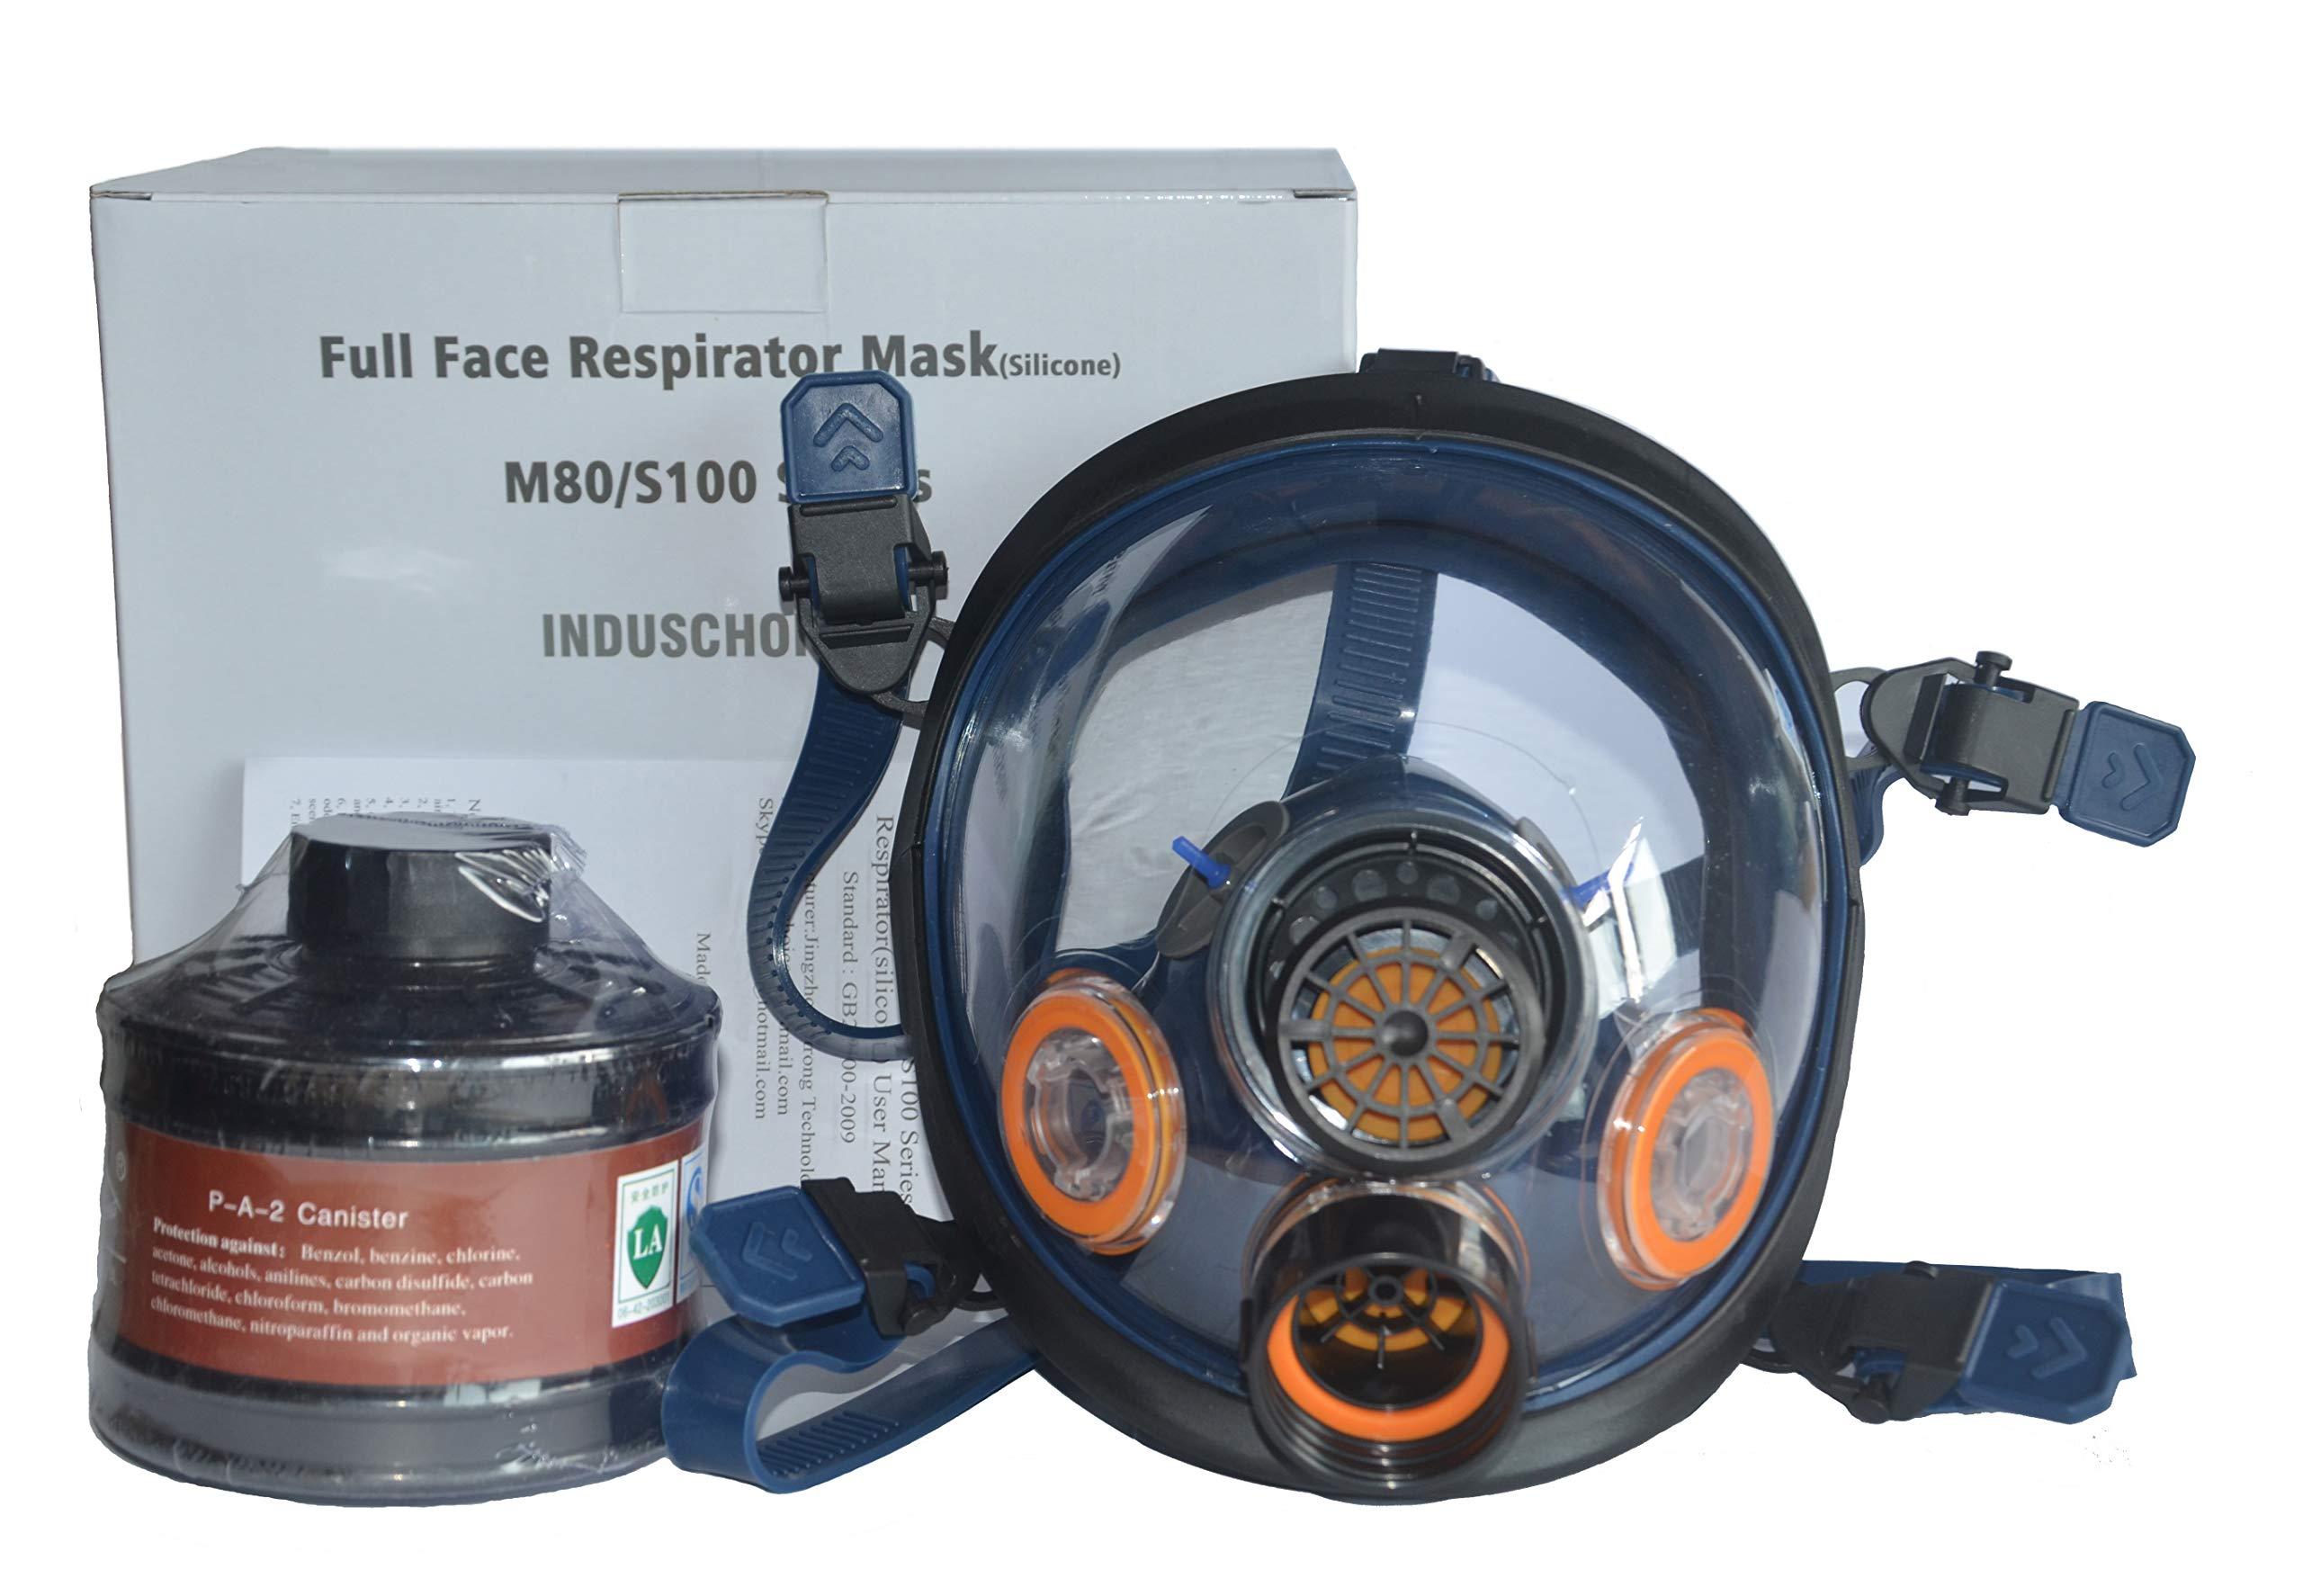 Induschoice Organic Vapor Full Face Respirator Mask Gas Mask Paint Pesticide Chemical Formaldehyde Anti Virus Respiratory Protection(Respirator +1 LDG3 Canister)